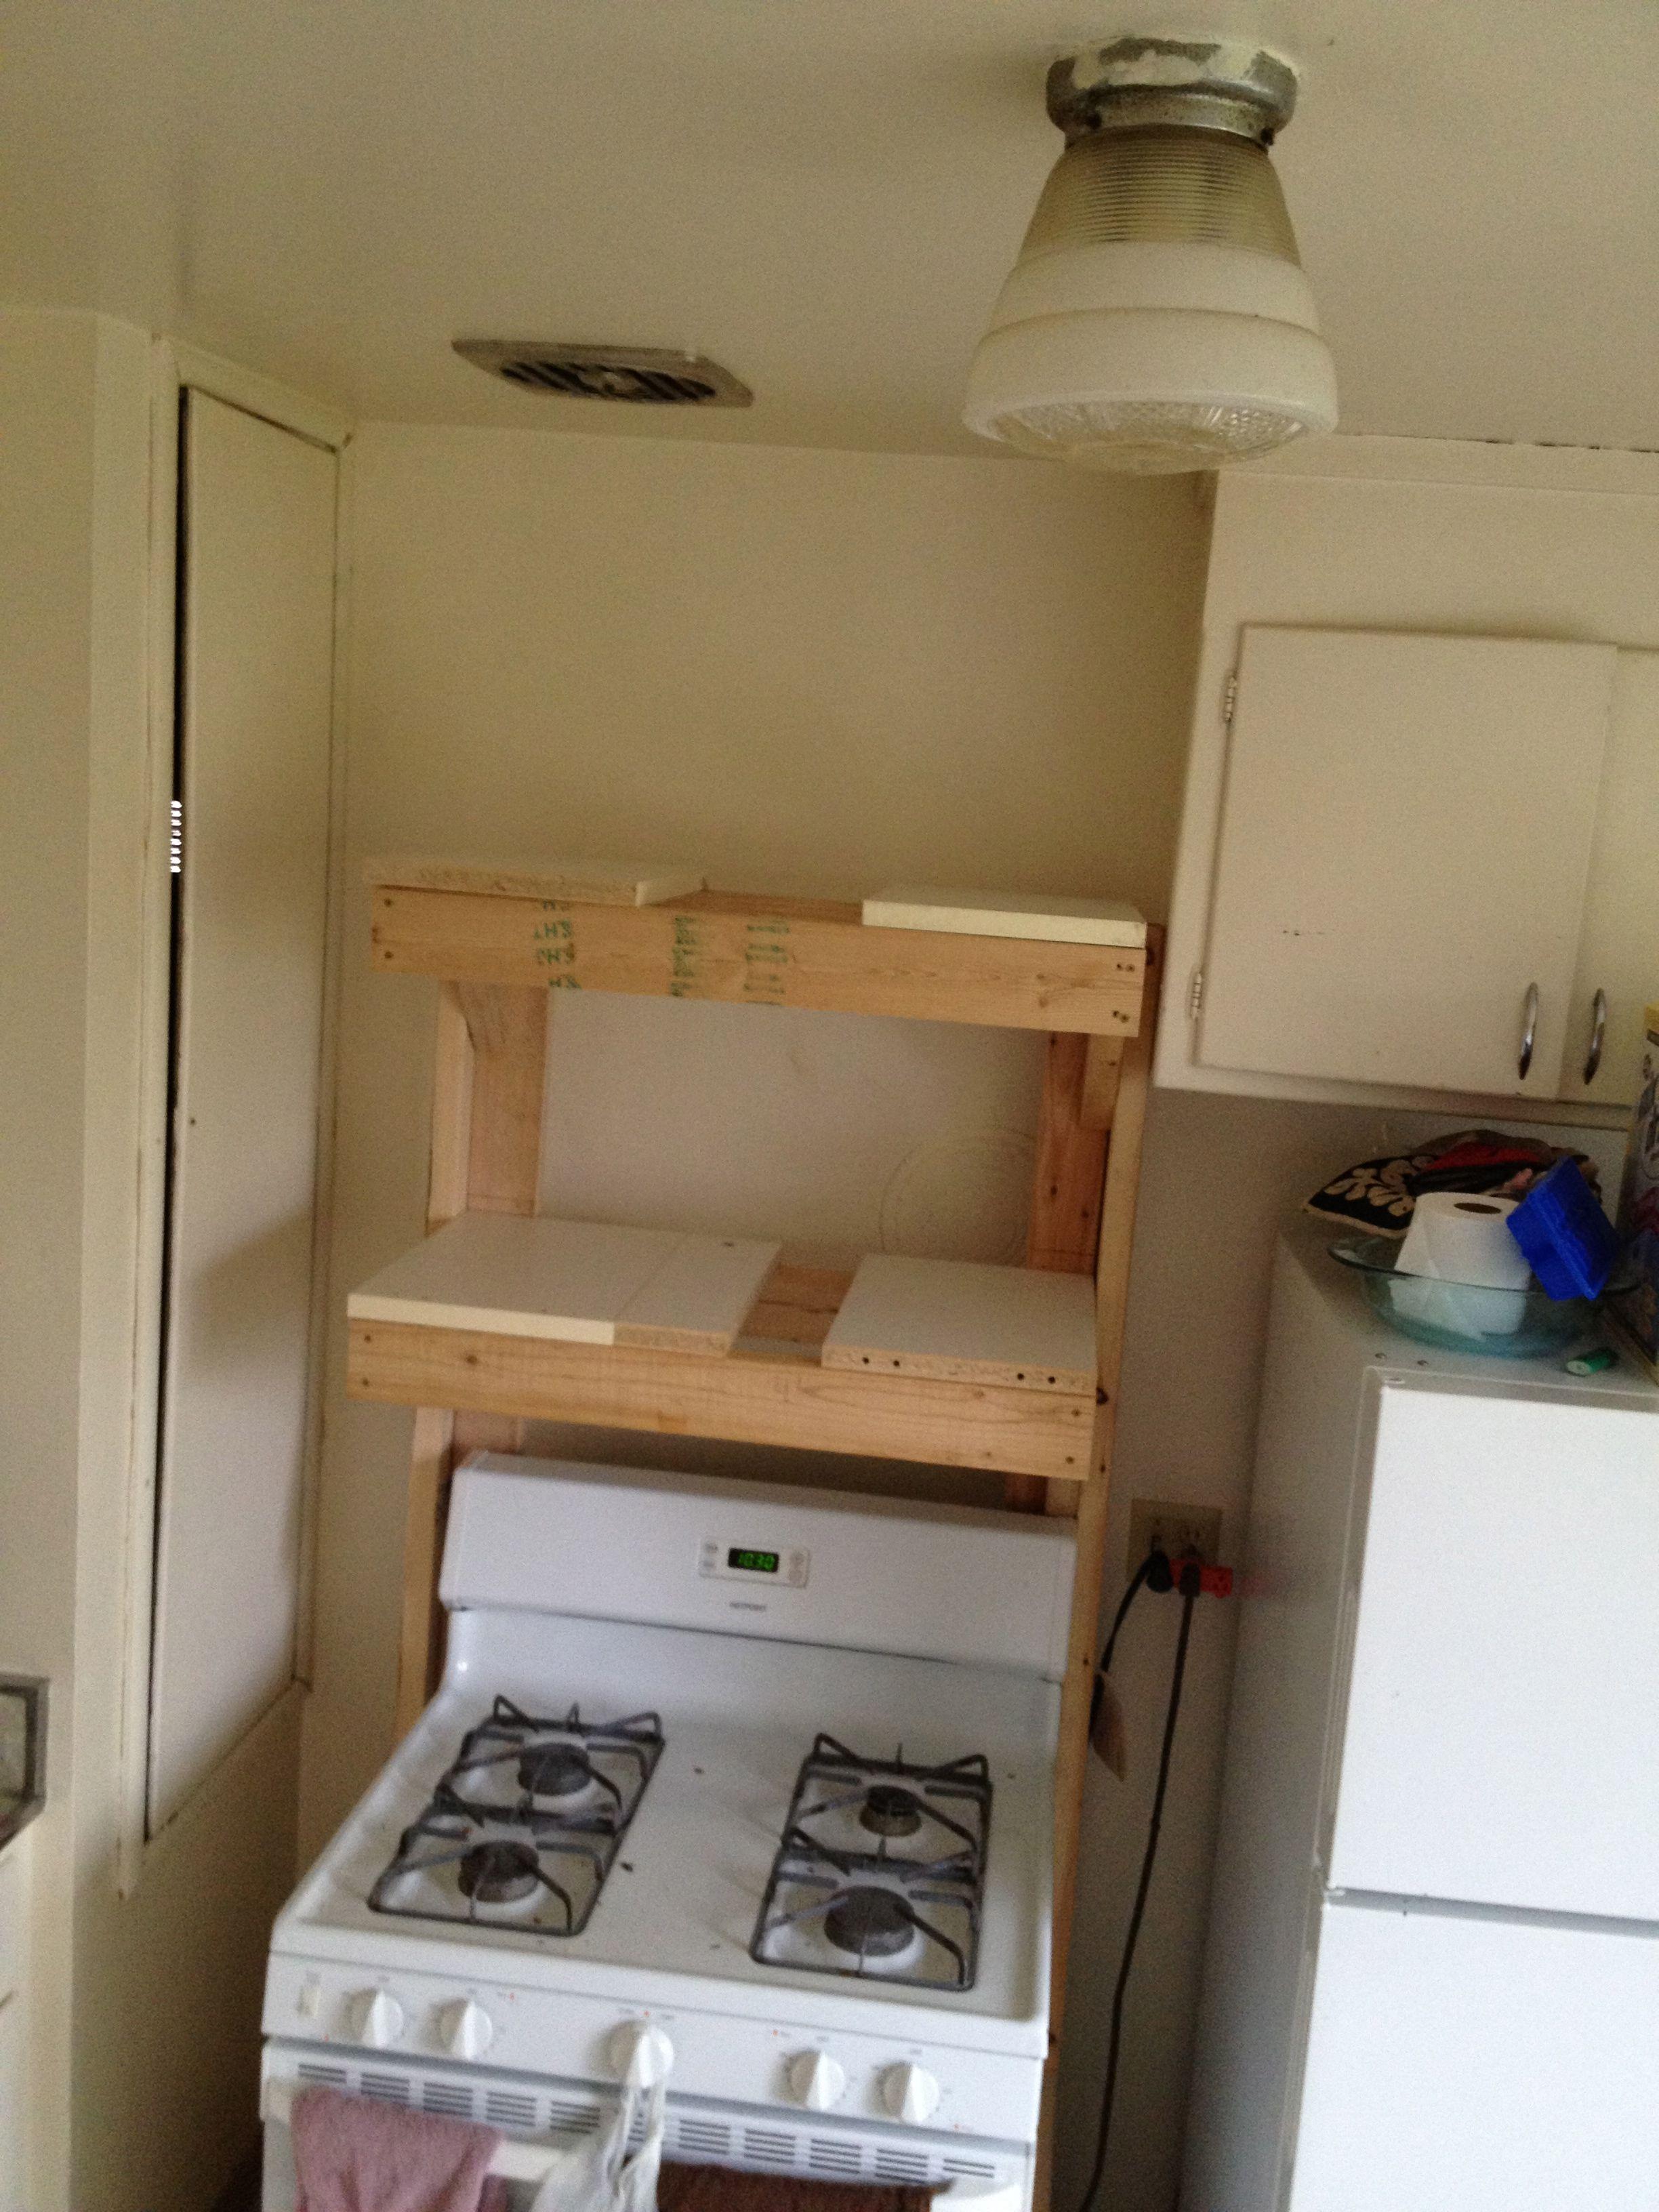 2x4 Freestanding Microwave Shelf Microwave Shelf Shelves